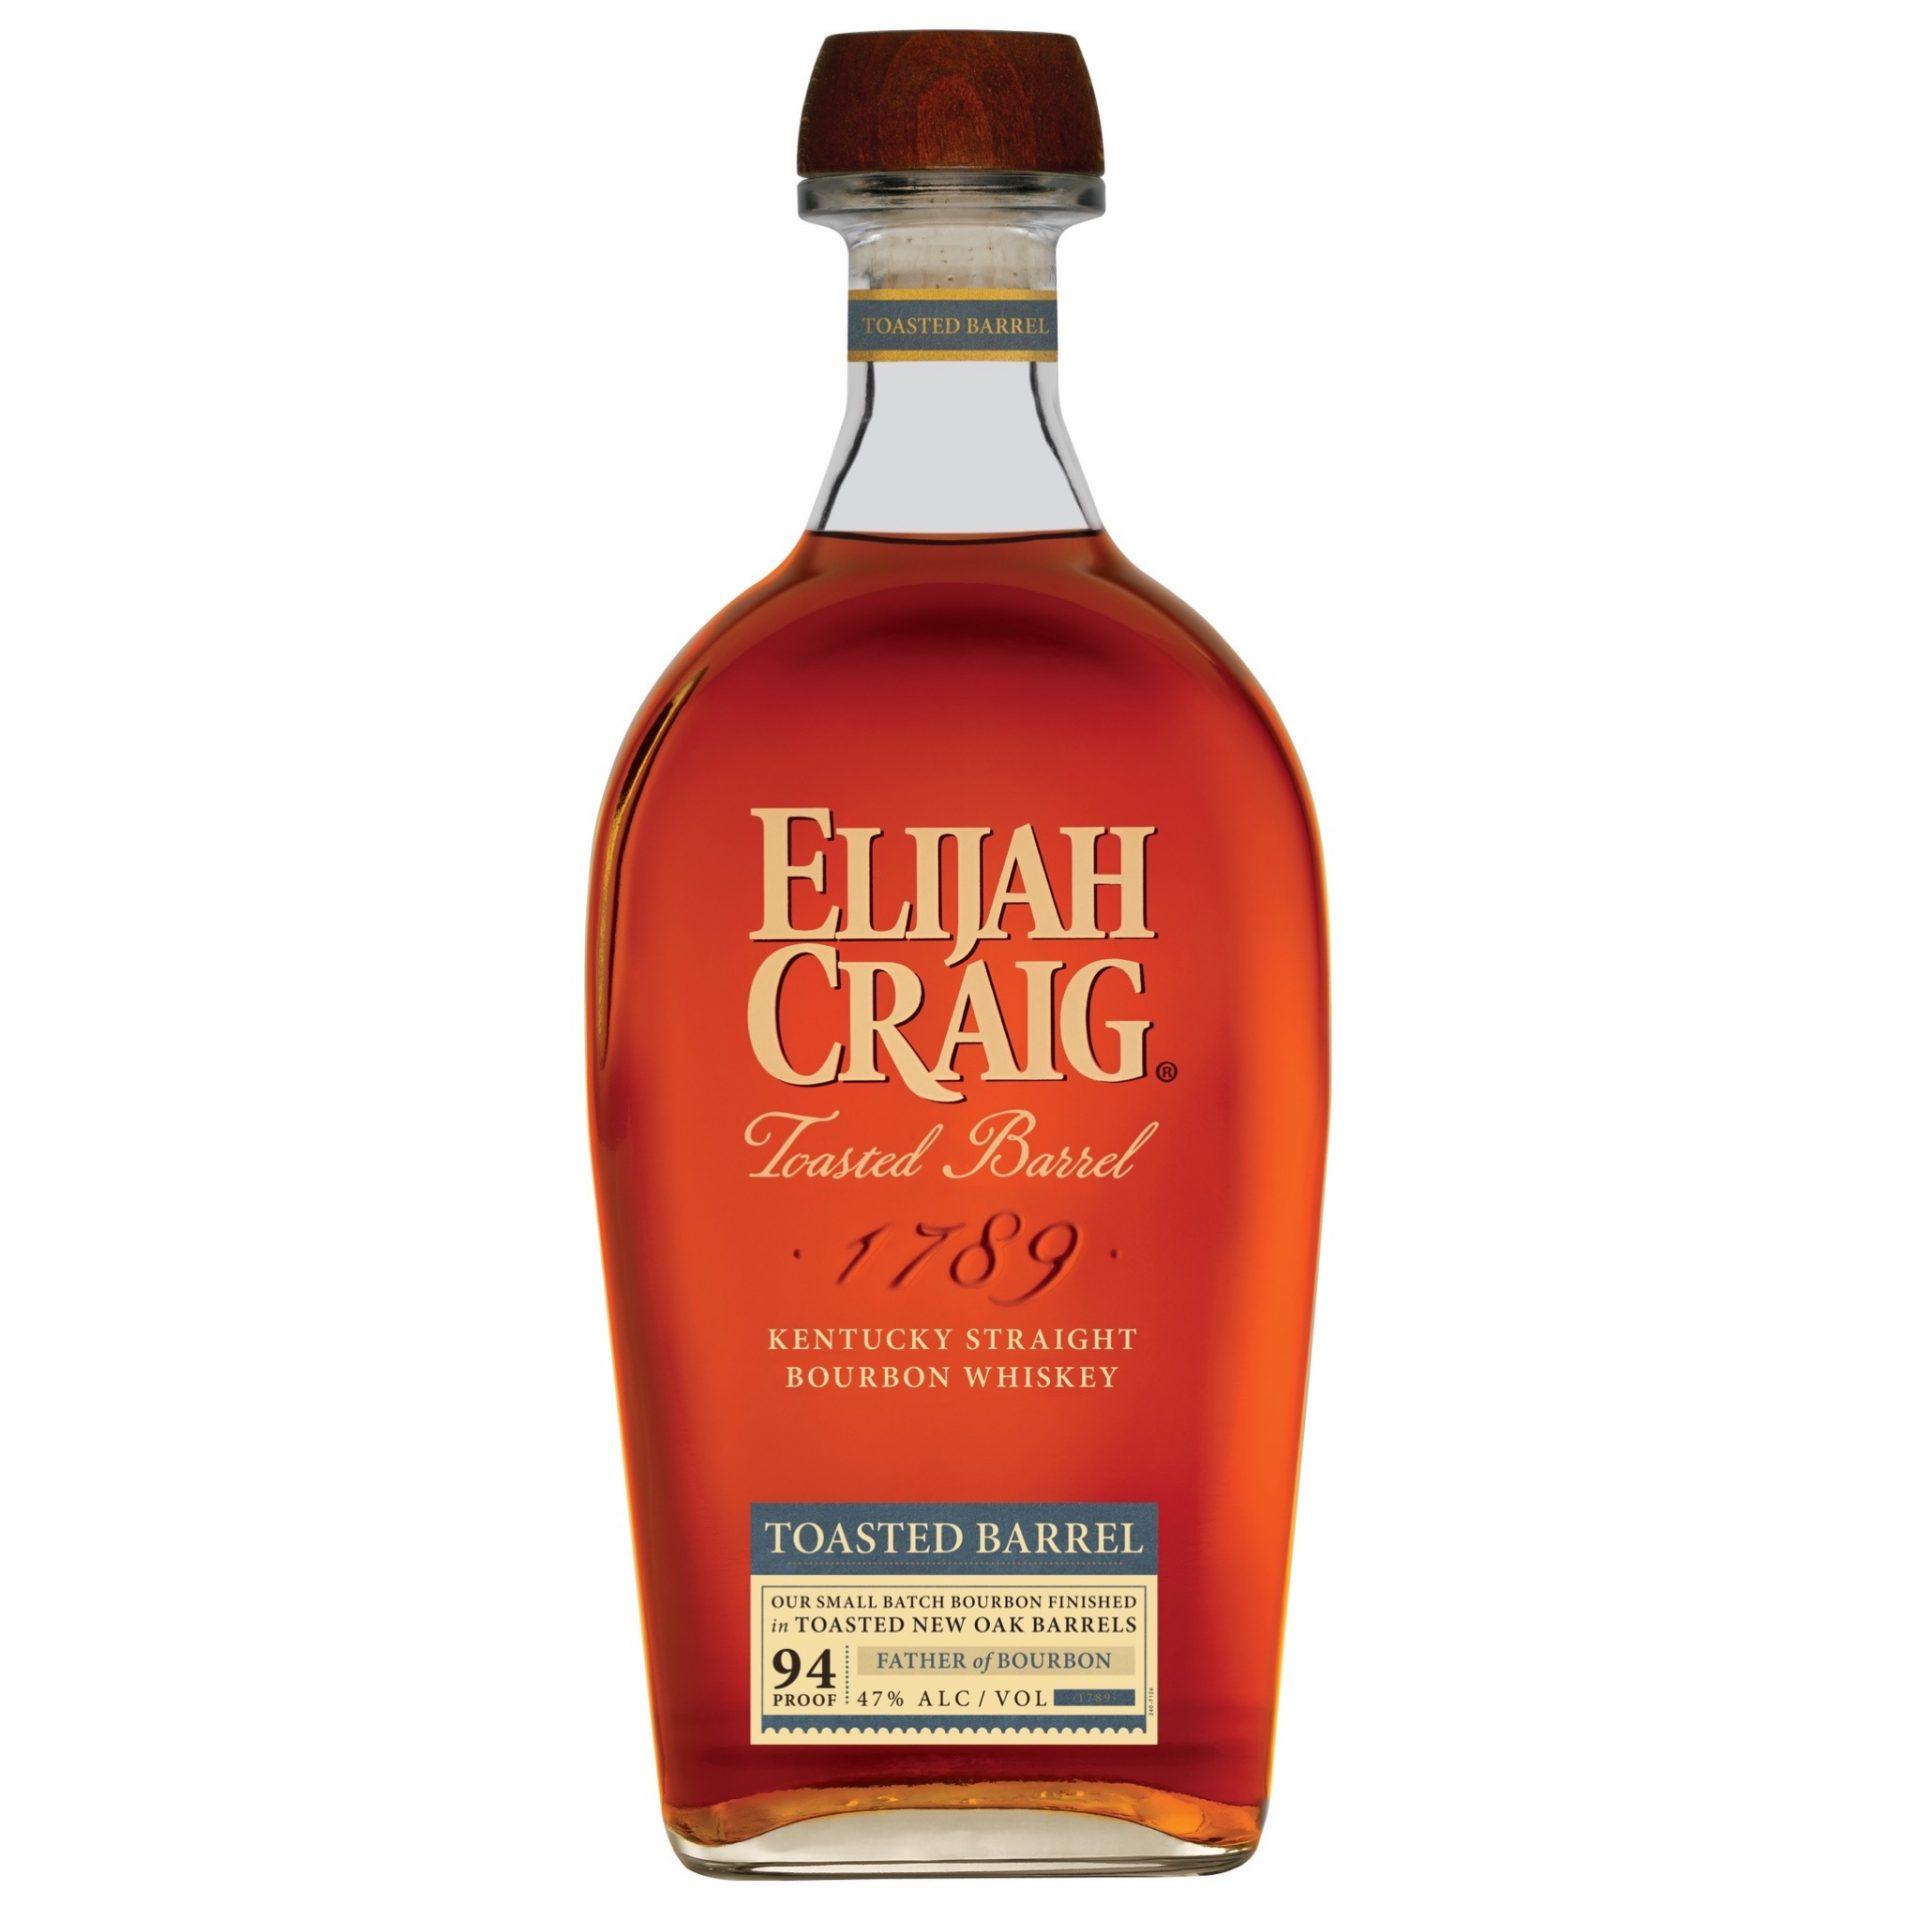 Elijah Craig Bourbon Toasted Barrel 94